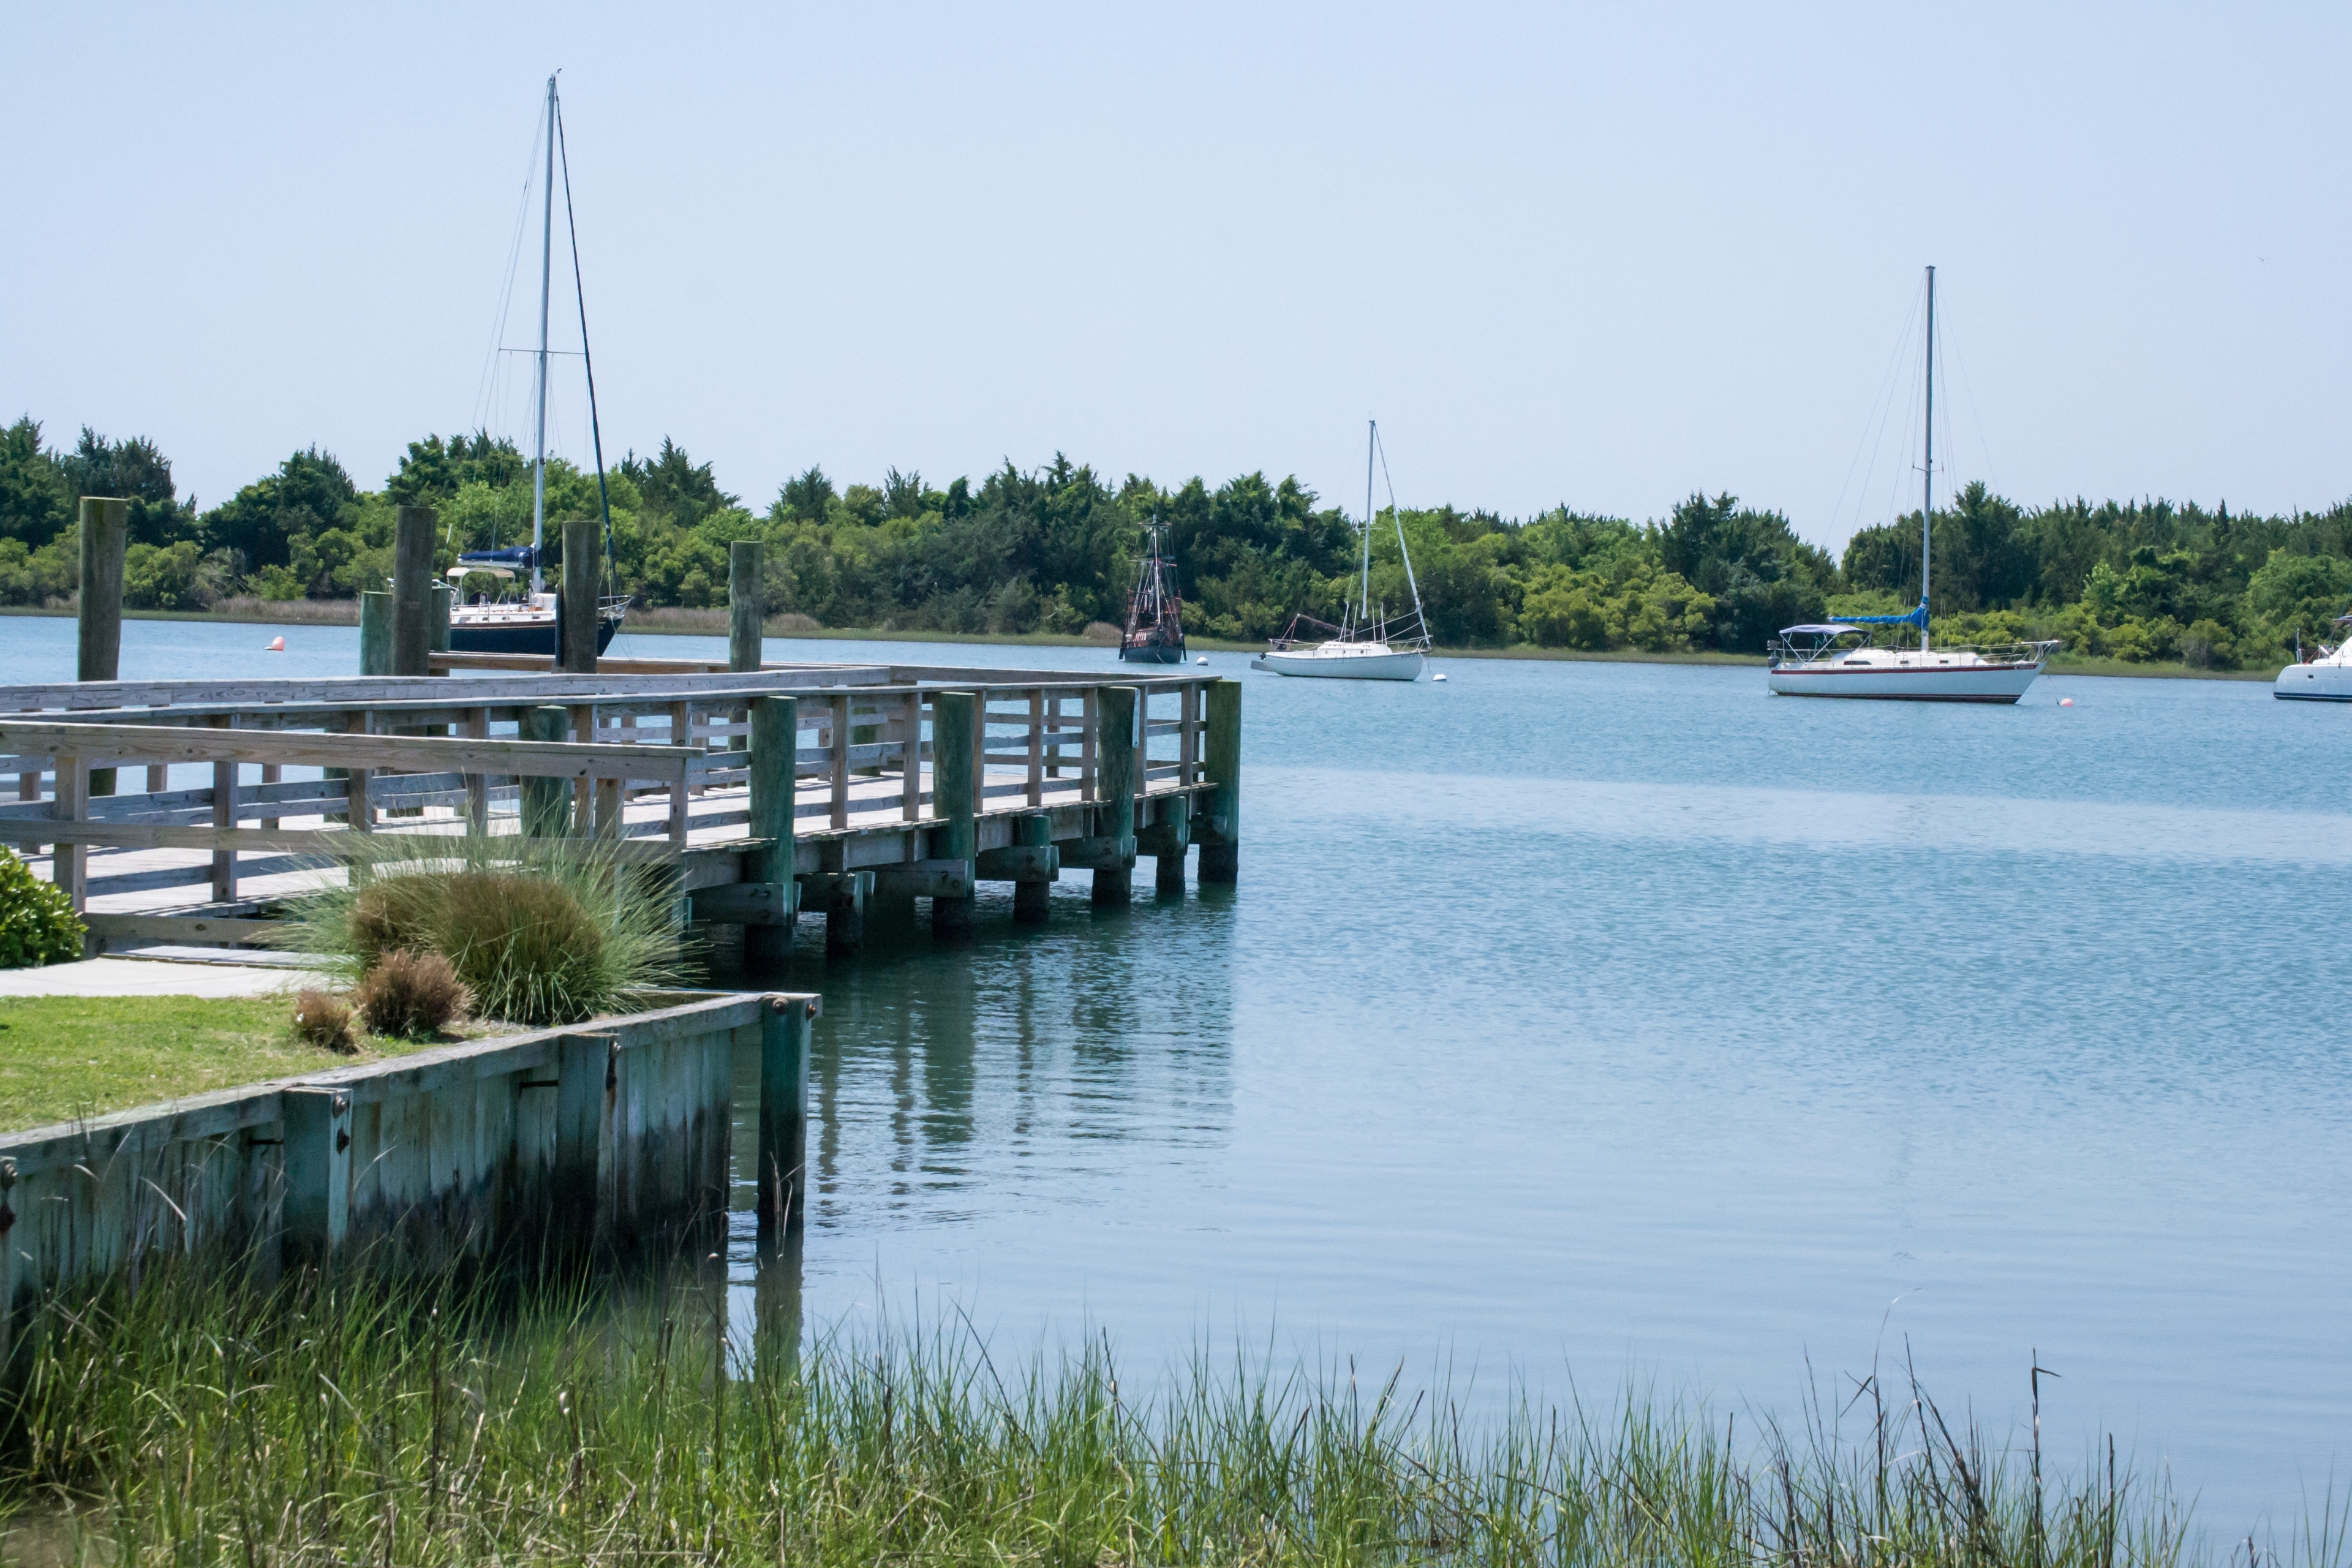 Beaufort, North Carolina, United States of America